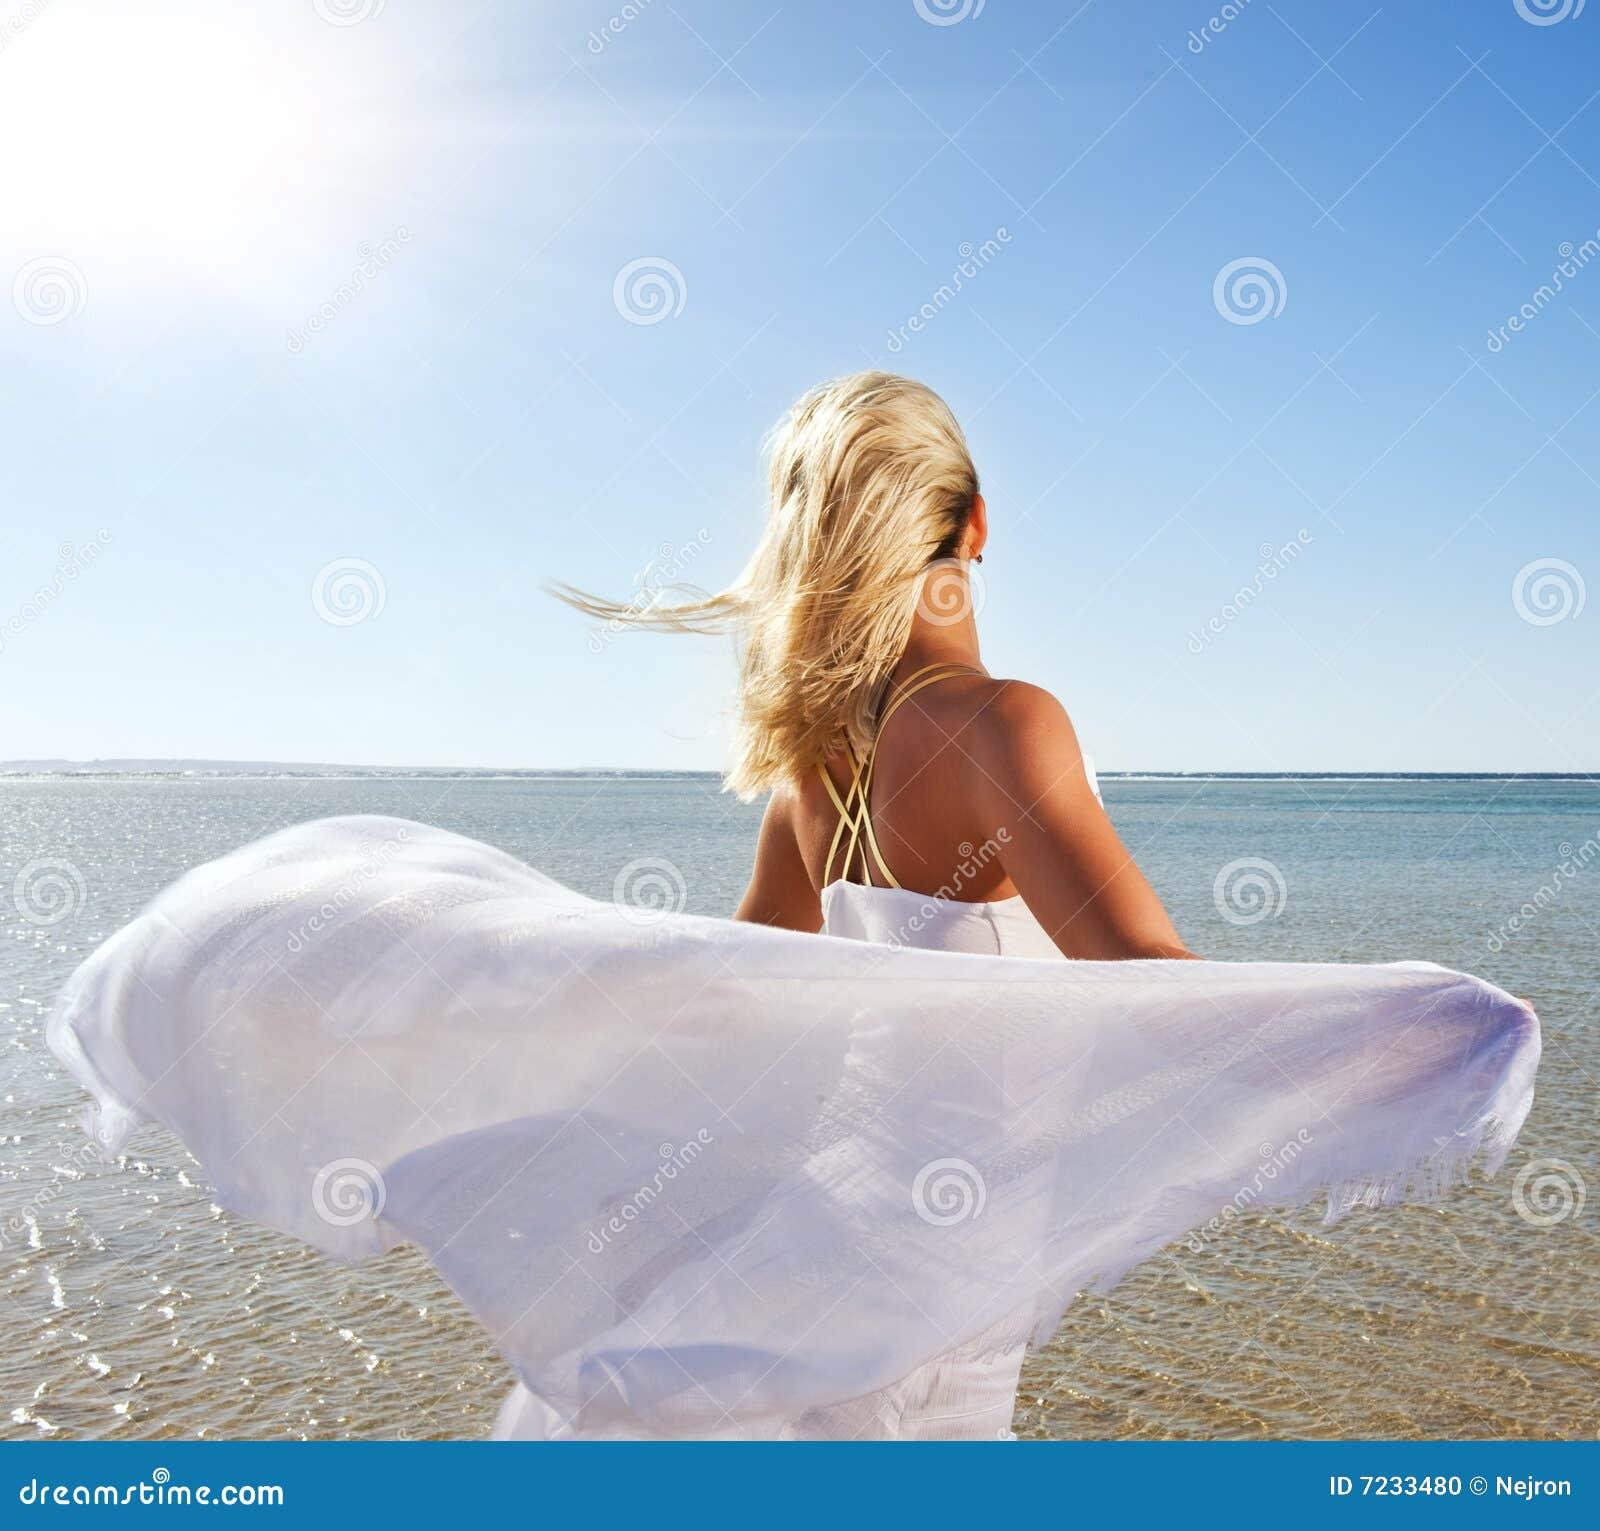 черно белые фото блондинок на море #11